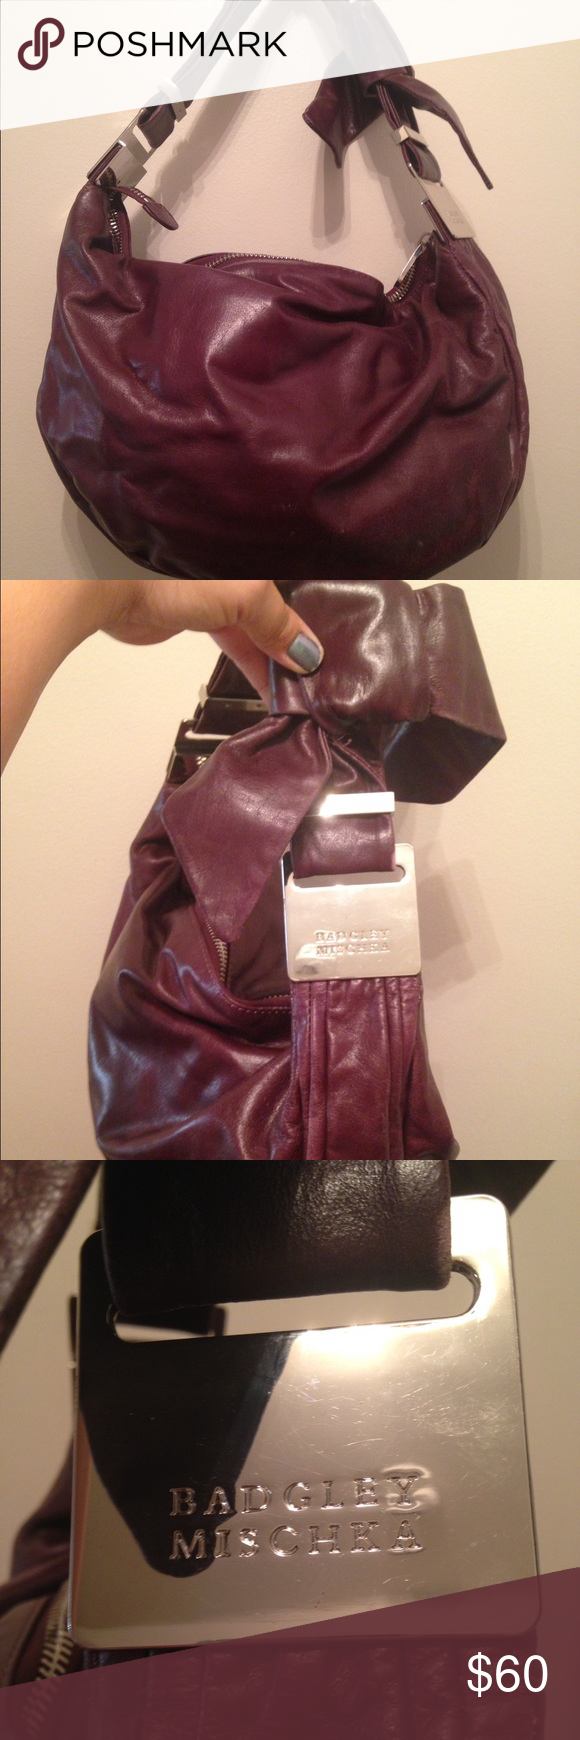 Auth Badgley Mischka plum leather hobo Beautiful purse, gently used Badgley Mischka Bags Hobos